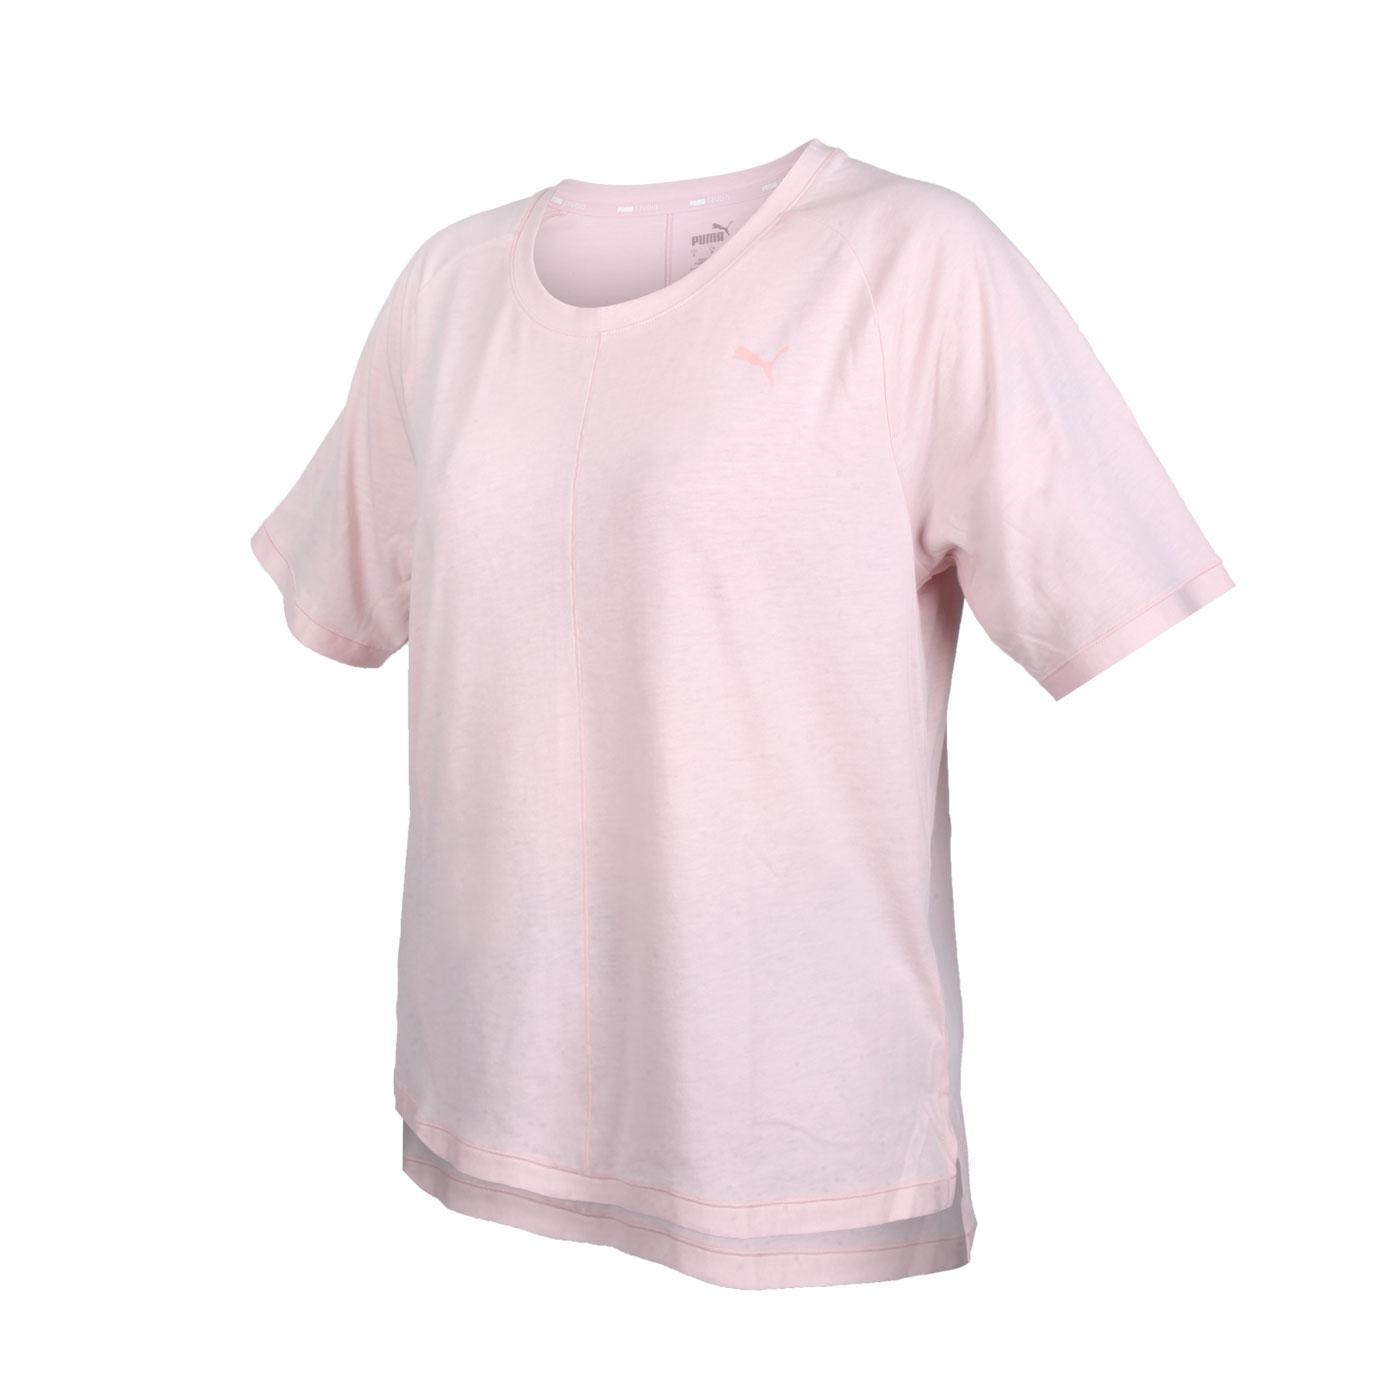 PUMA 女款瑜珈系列Studio寬鬆短袖T恤 52109336